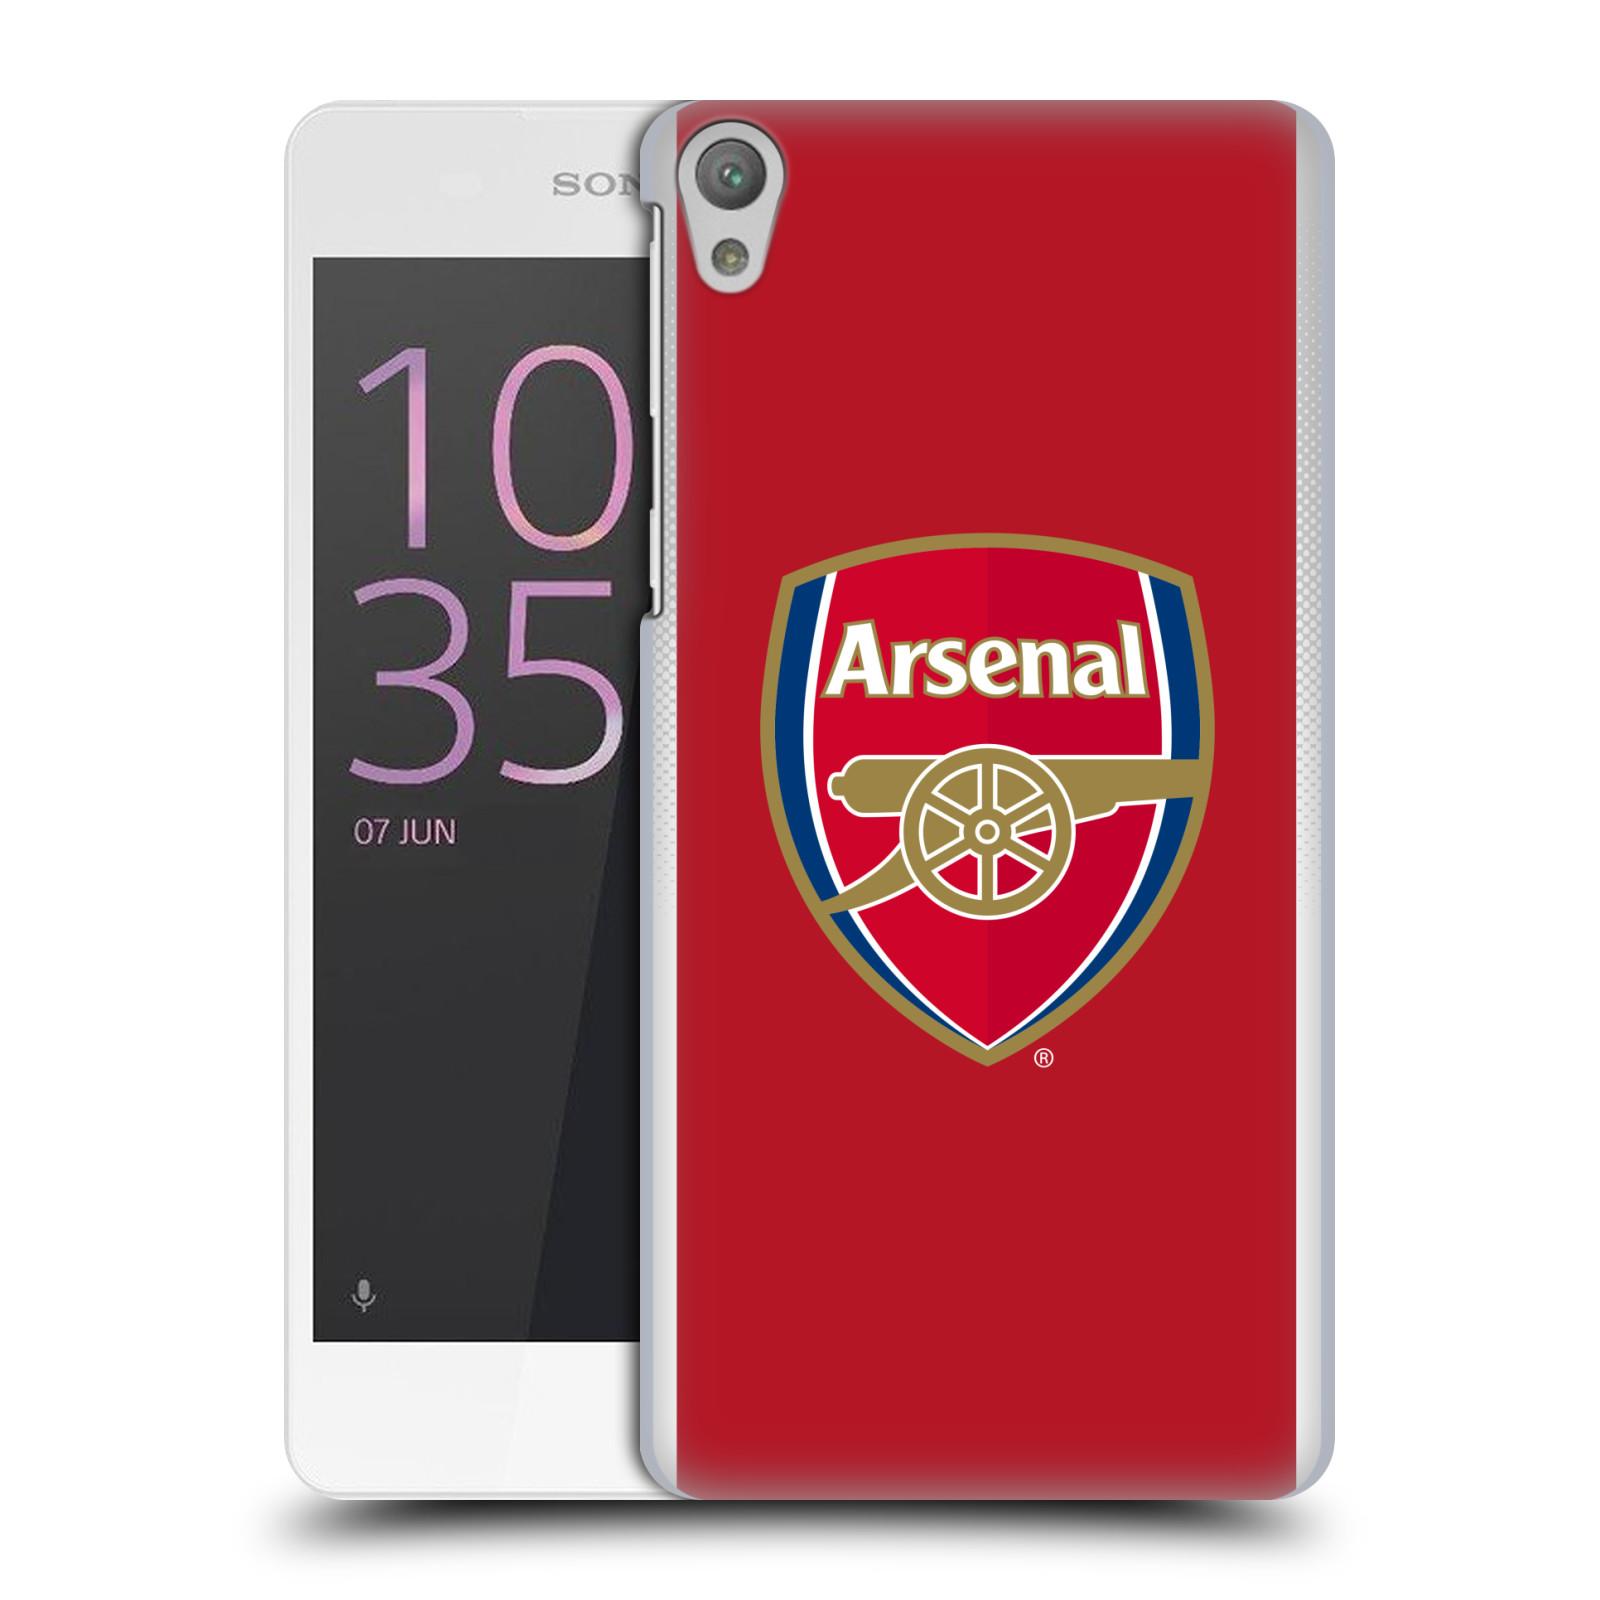 Plastové pouzdro na mobil Sony Xperia E5 - Head Case - Arsenal FC - Logo klubu